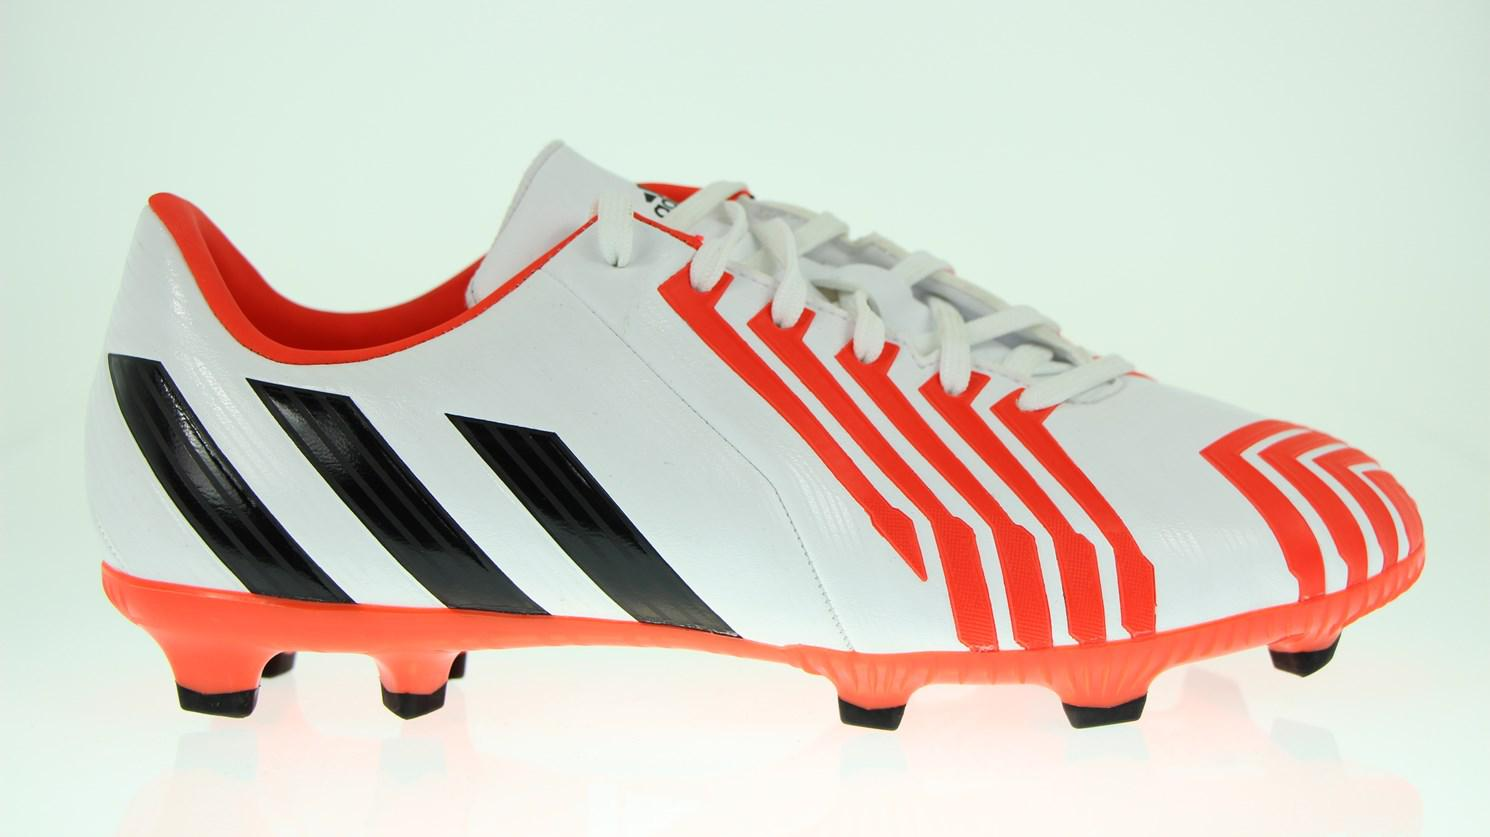 f4b489a6 Buty piłkarskie adidas Predator Absolado Instinct FG J B24176 ...